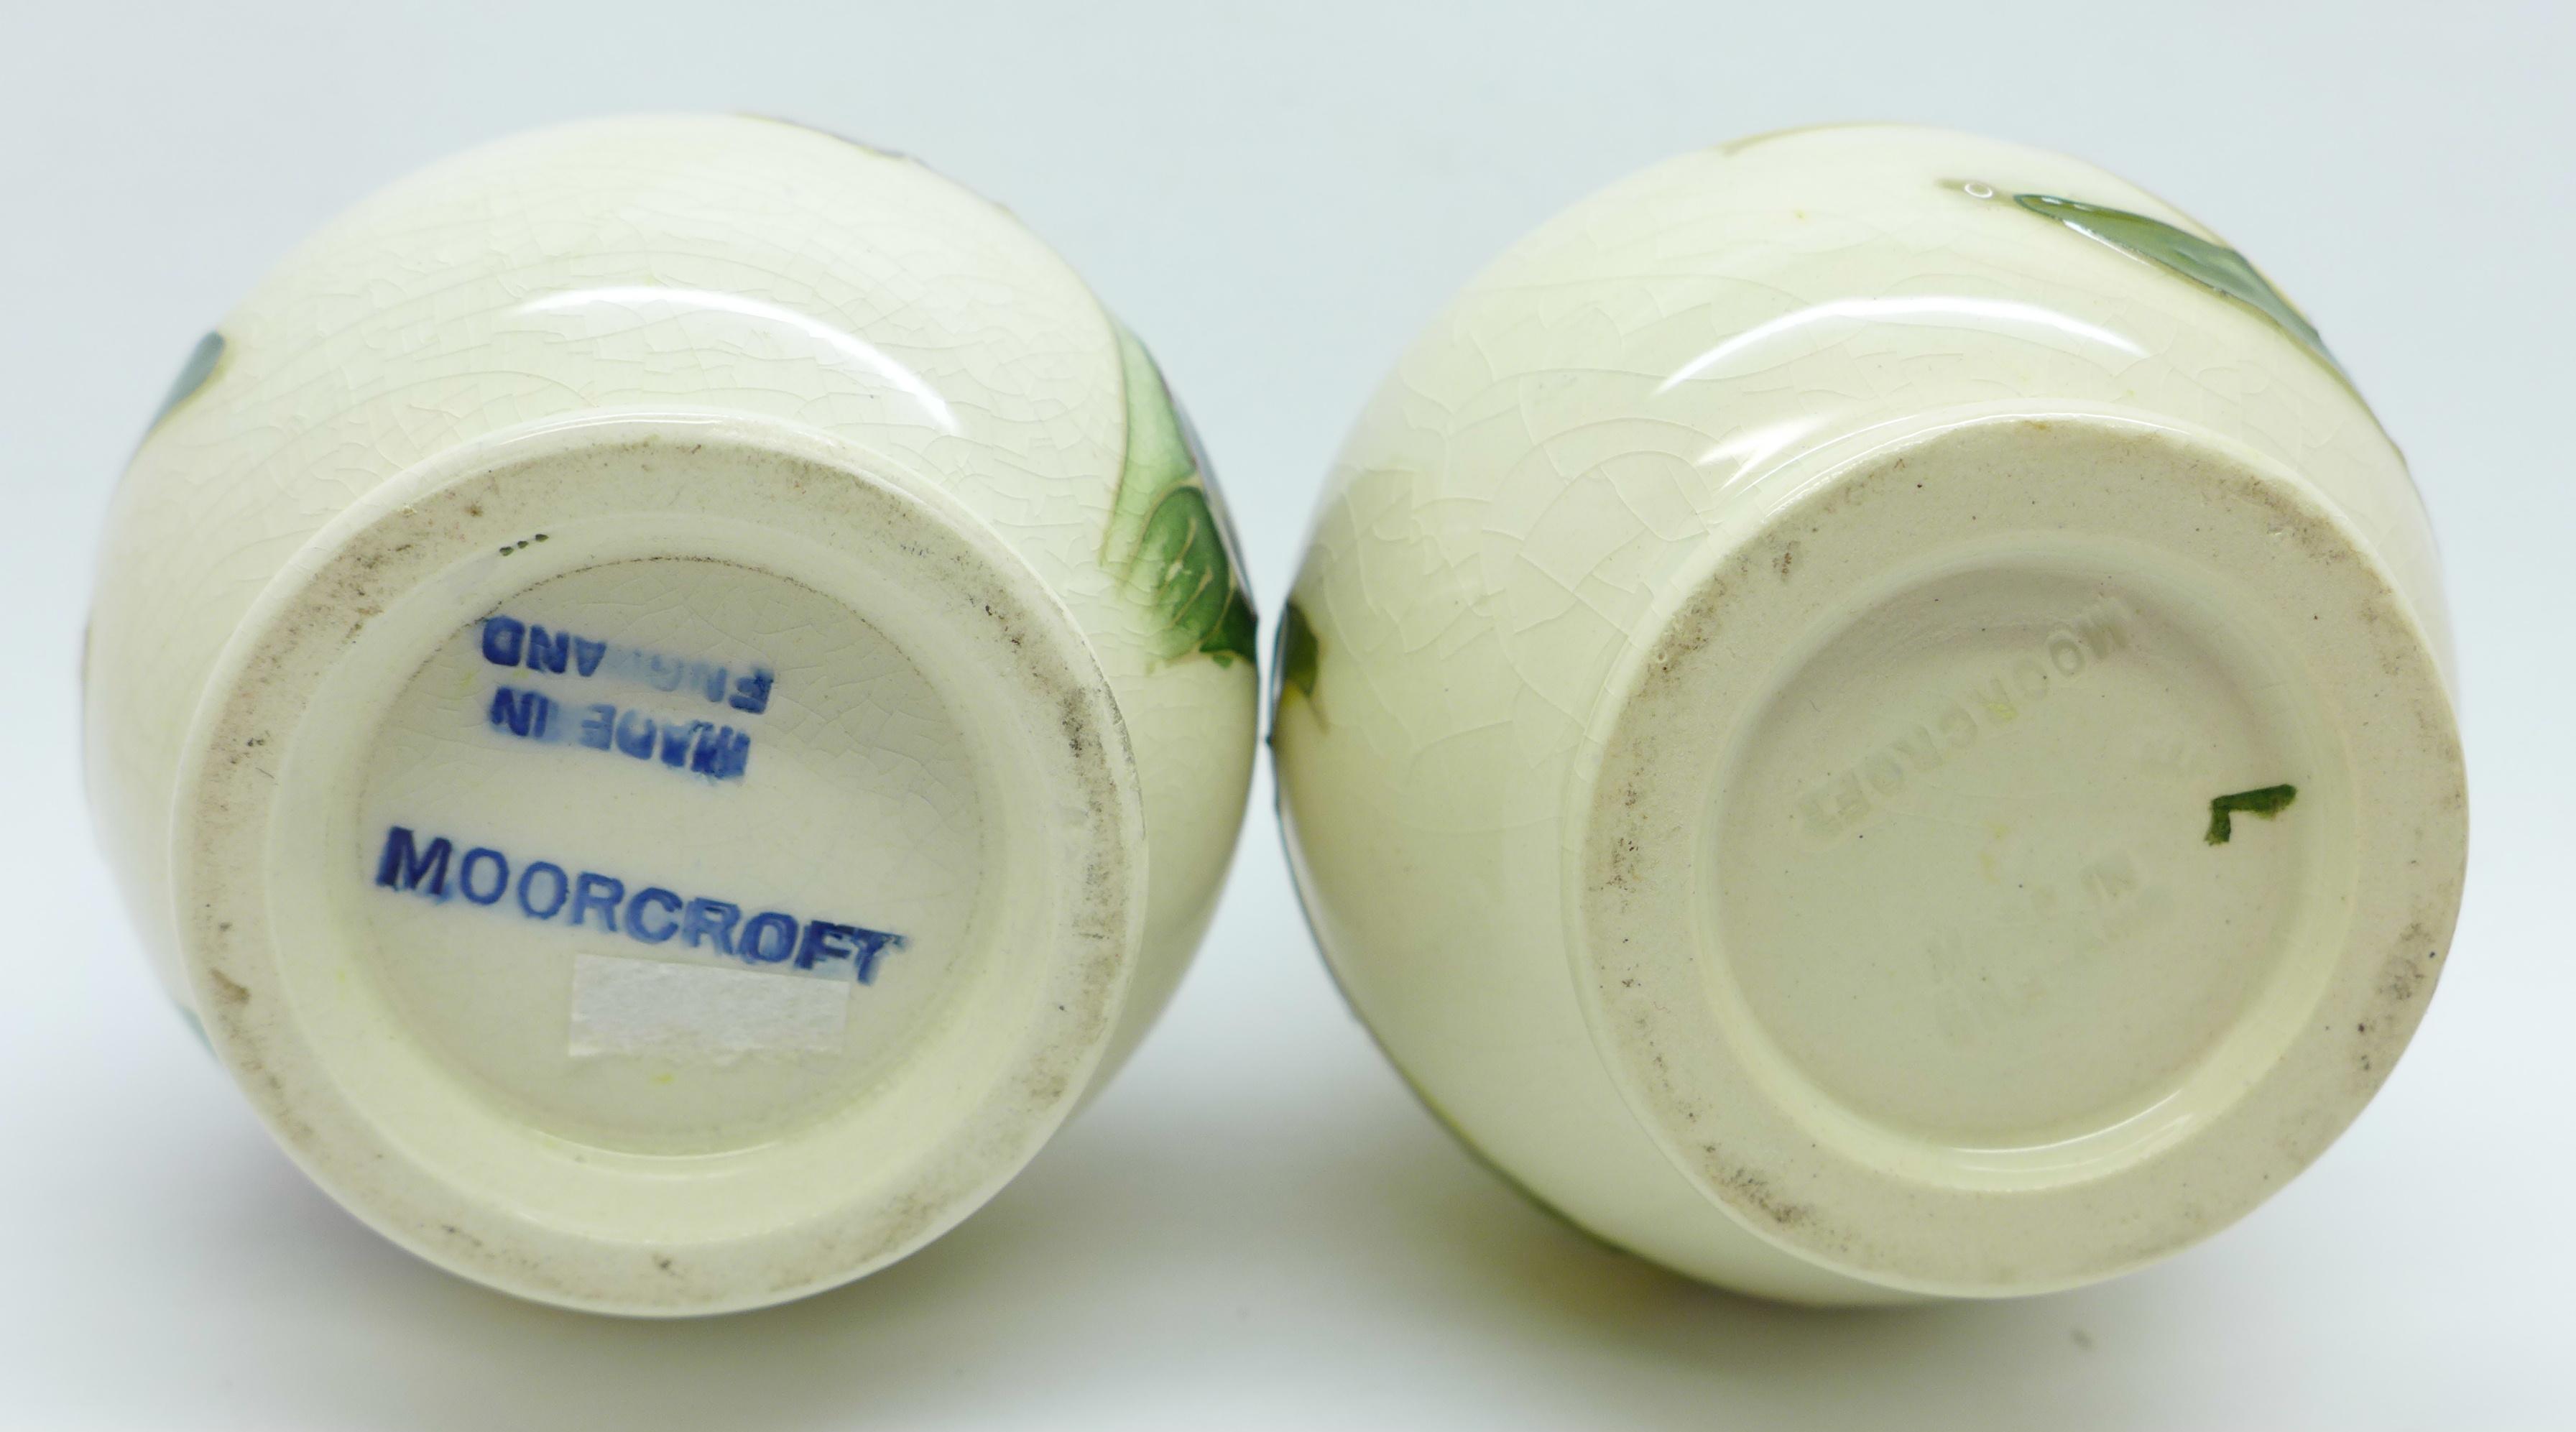 Two Moorcroft vases, crazed, 92mm, (57,58) - Image 6 of 7